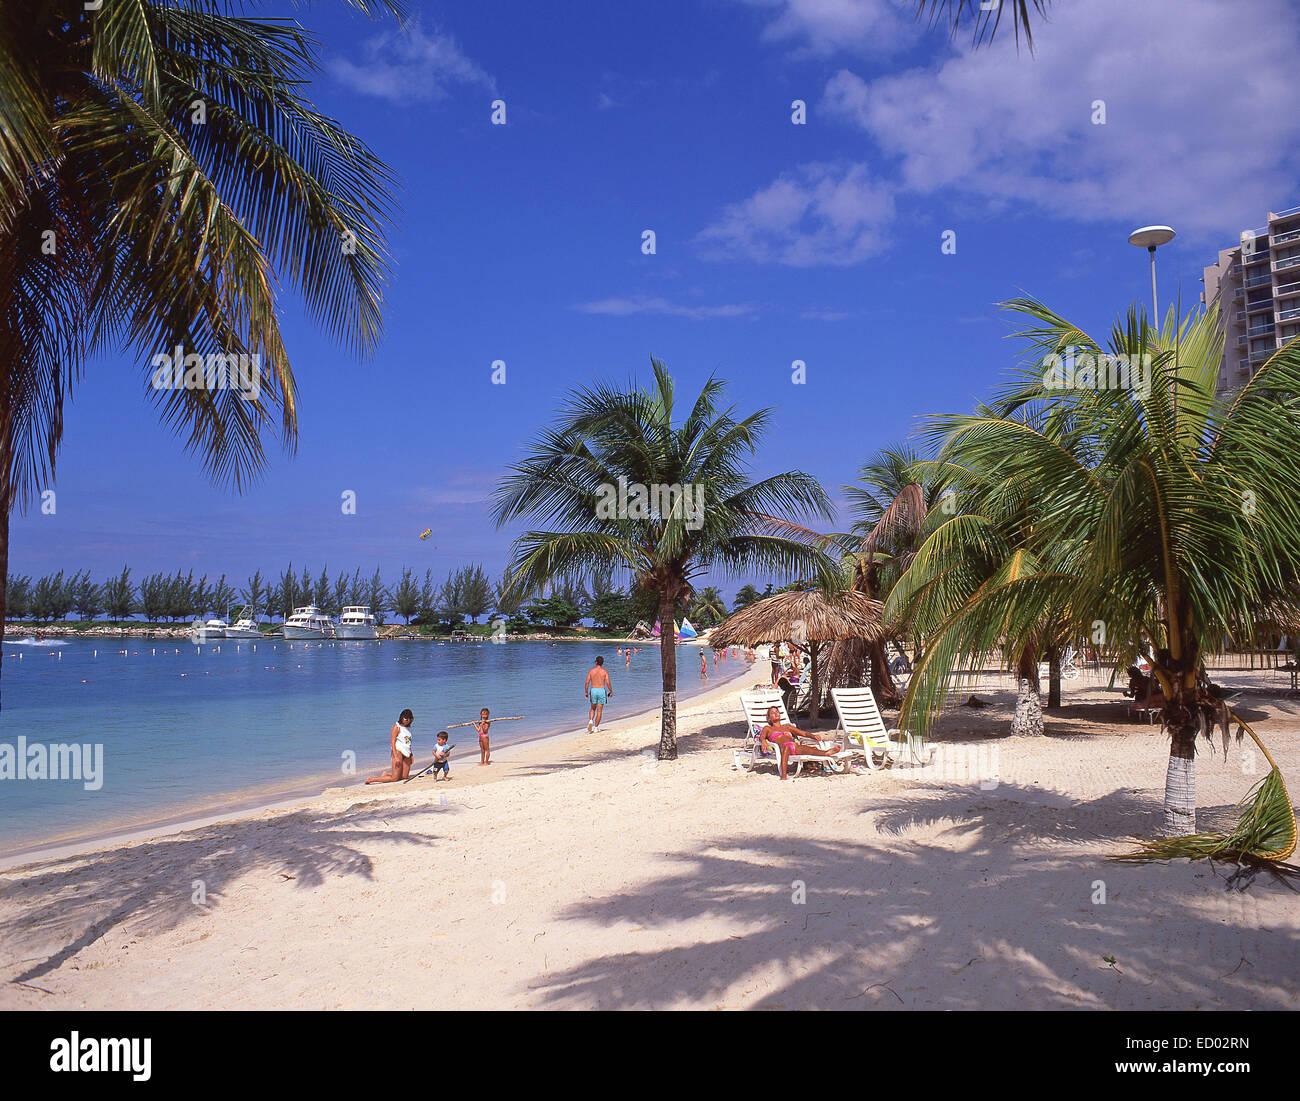 Beach view, Turtle Beach, Ocho Ríos, Saint Ann Parish, Jamaica, Greater Antilles, Caribbean - Stock Image